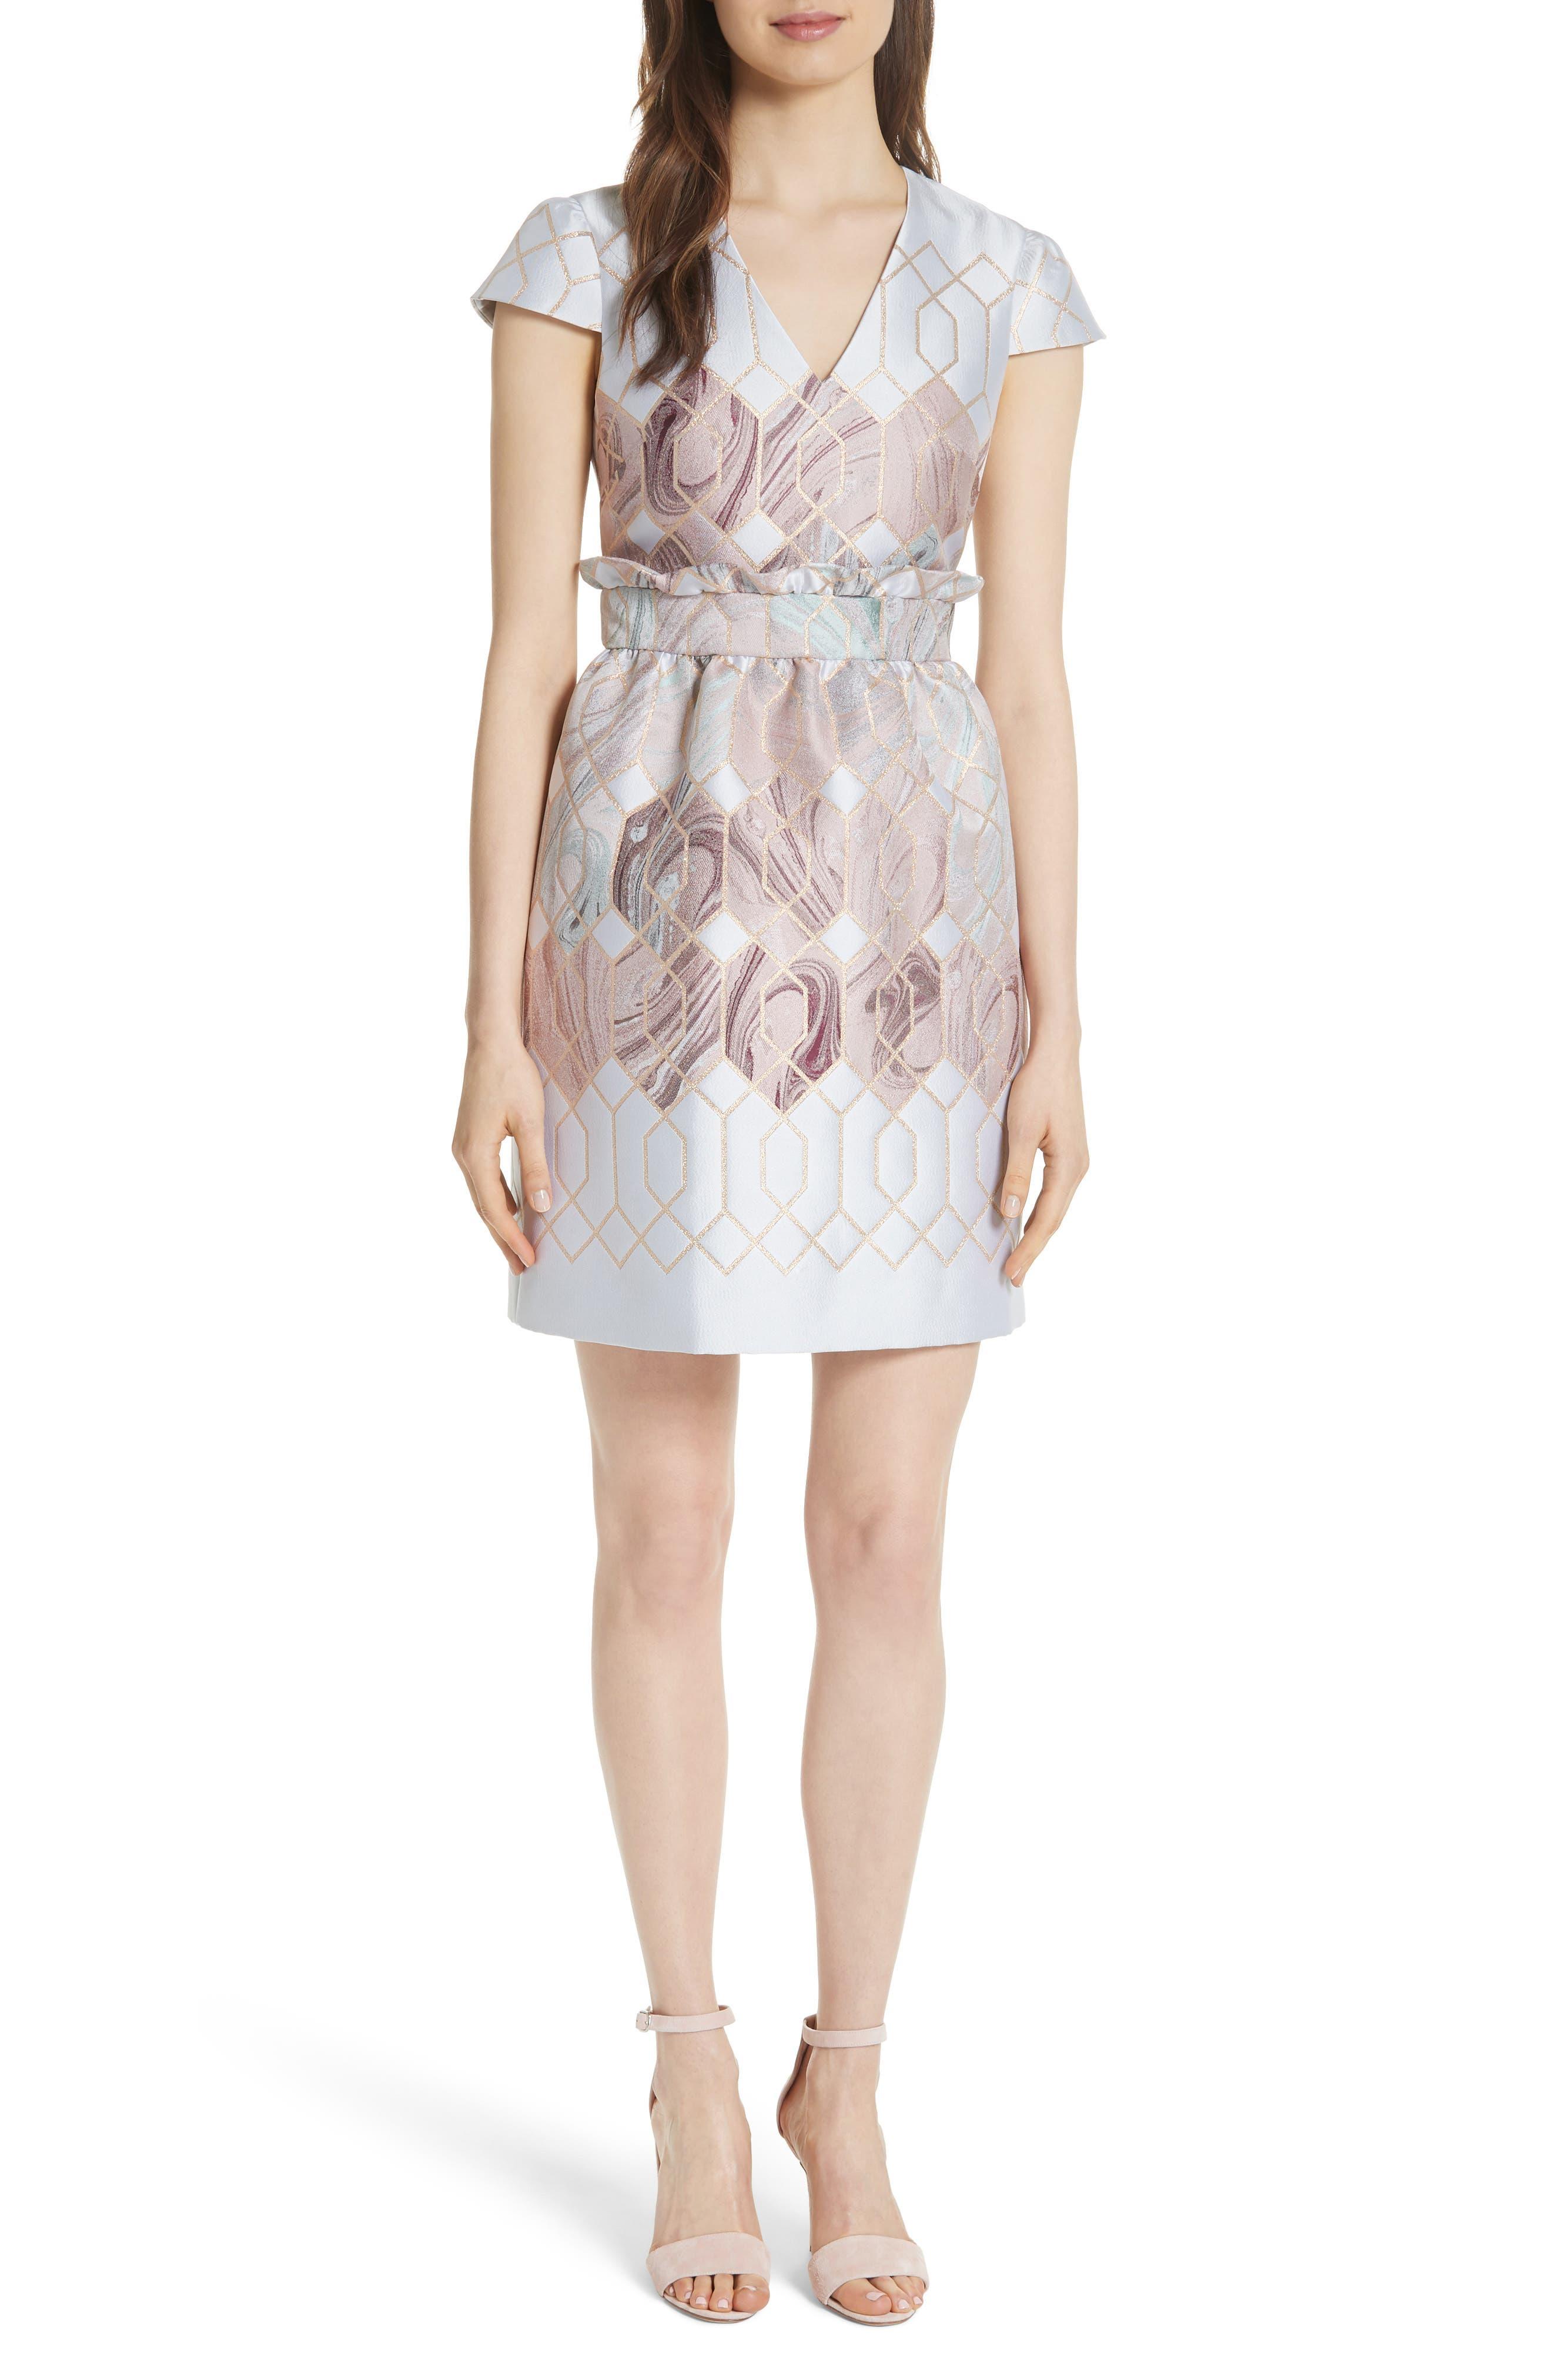 Ingrida Sea of Clouds Tulip Dress,                             Main thumbnail 1, color,                             White